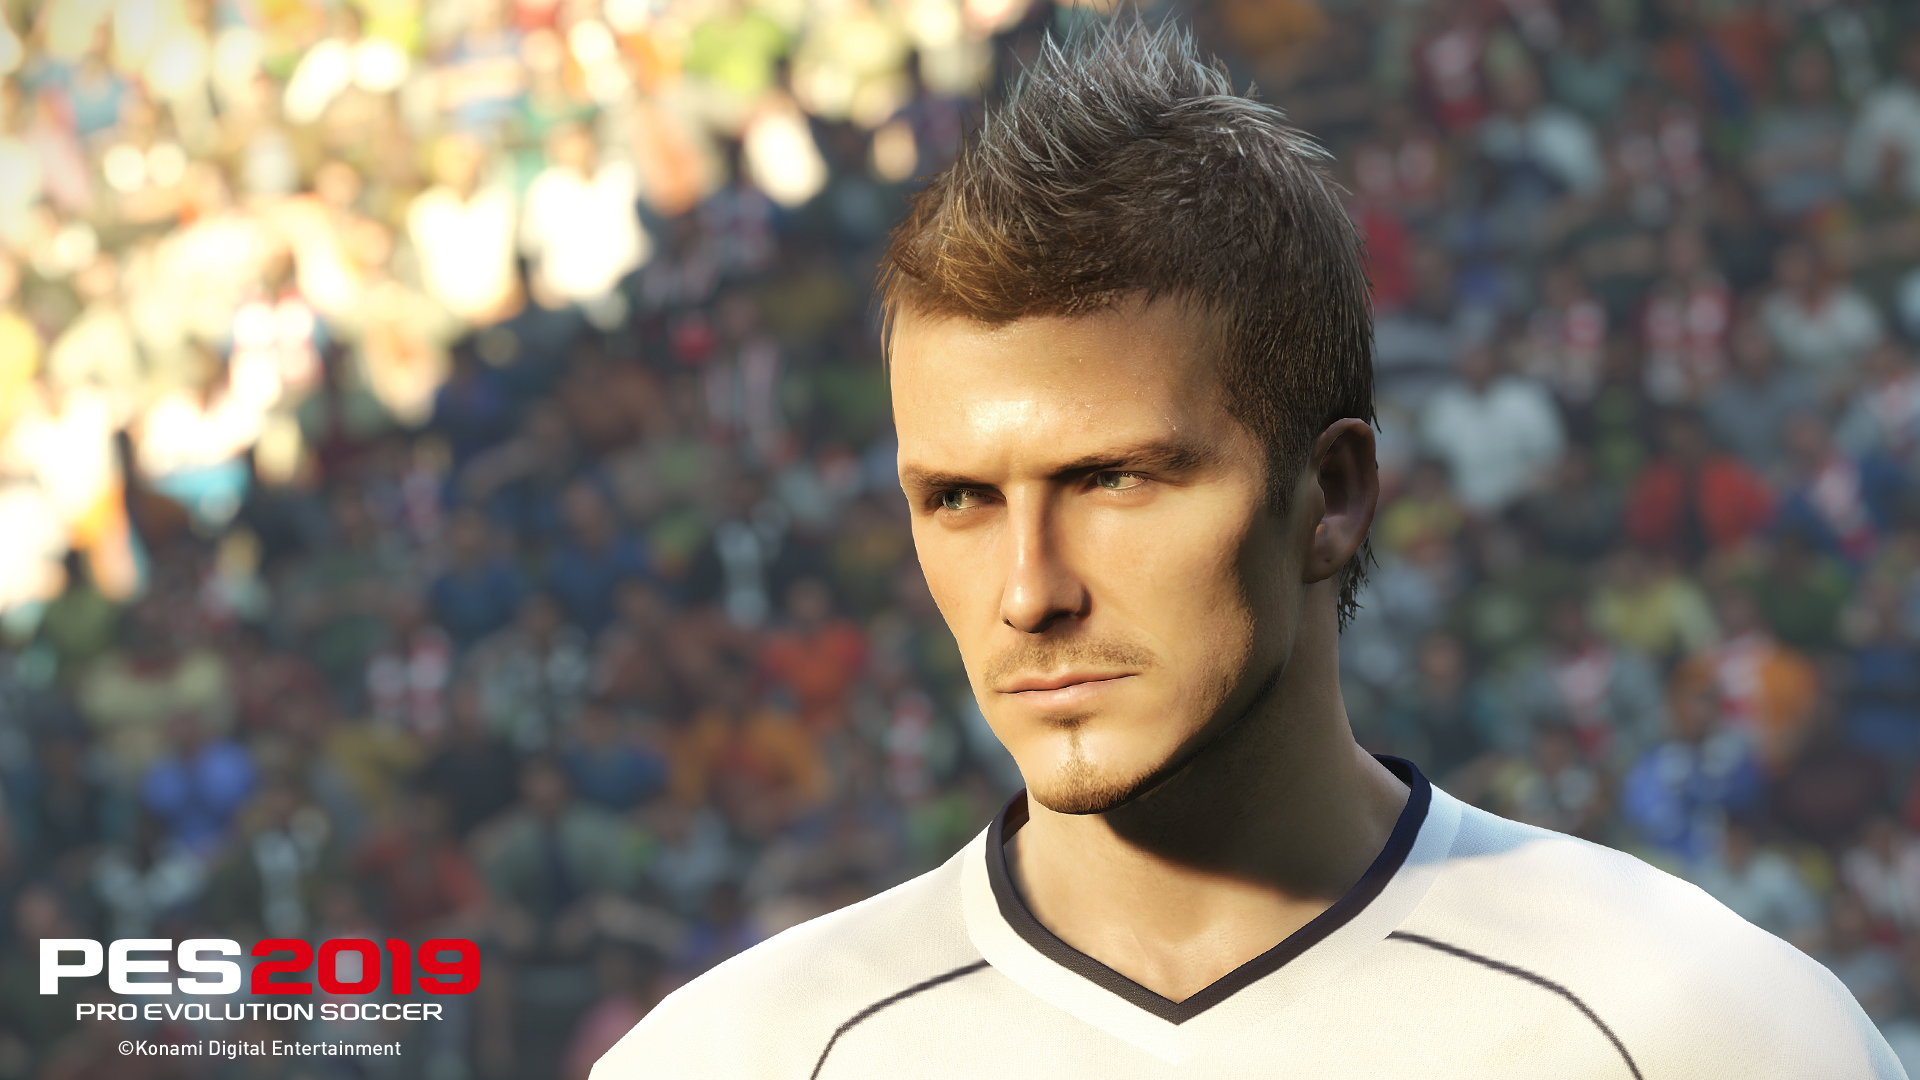 PES 2019 Beckham